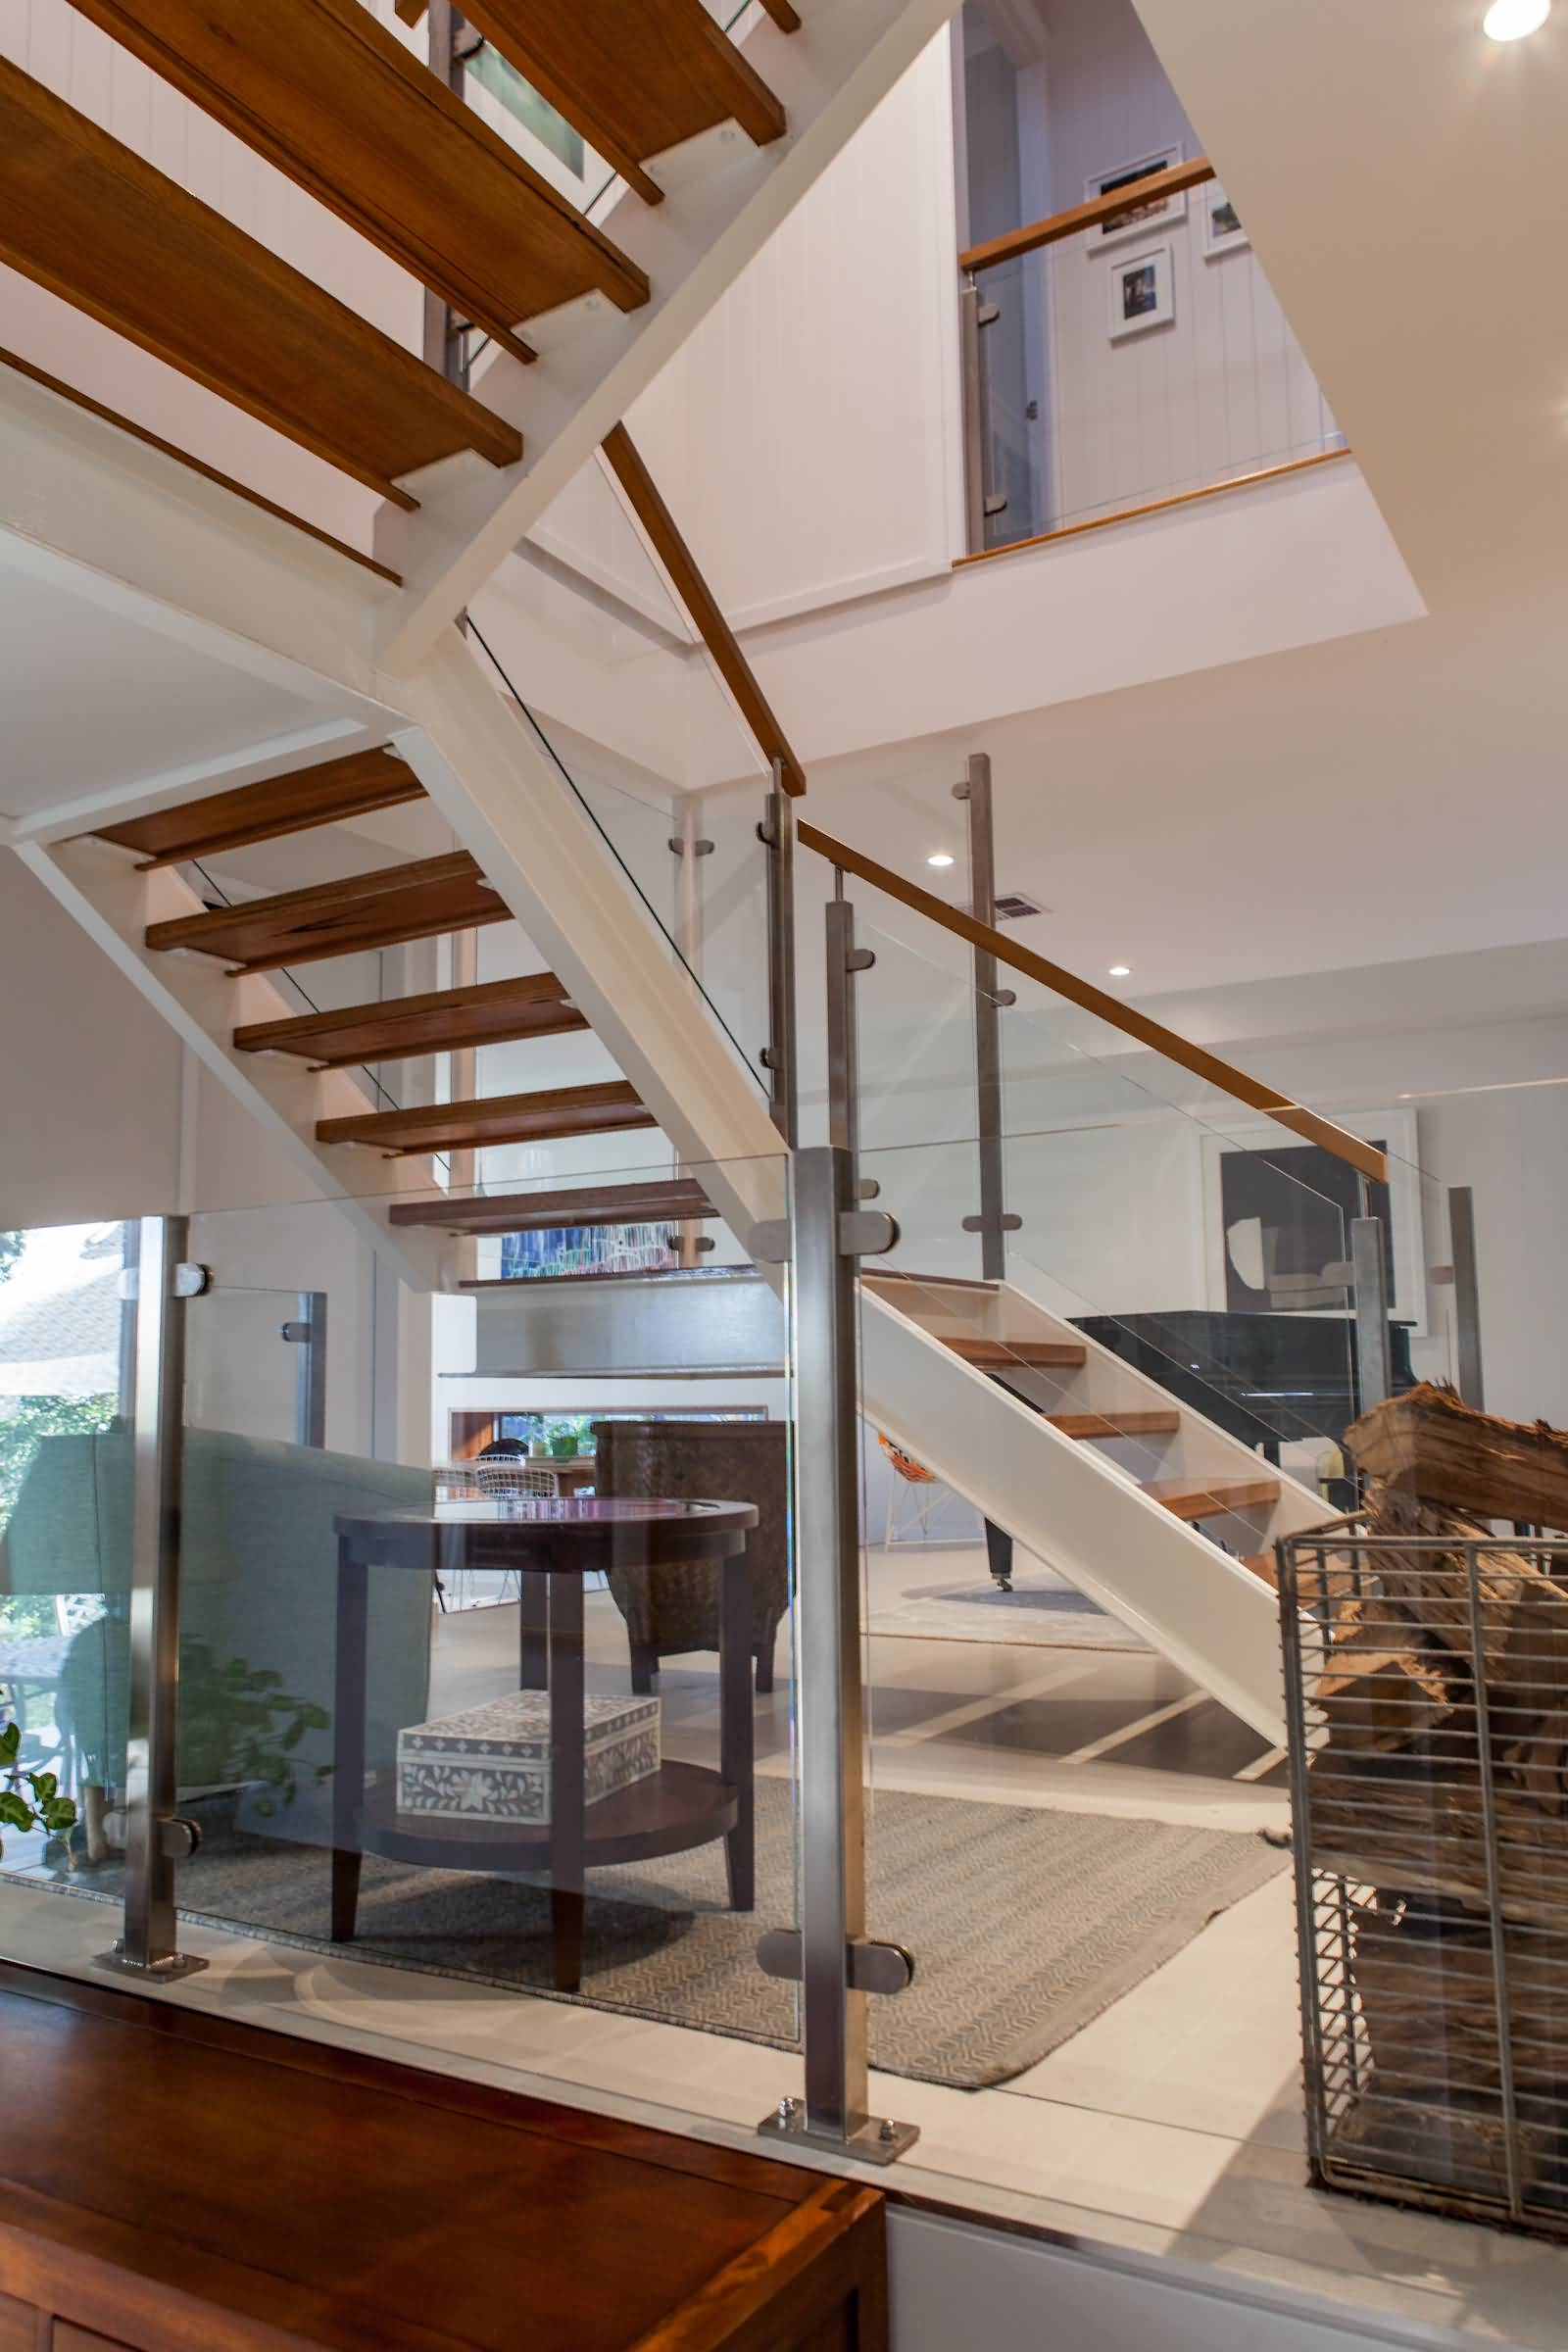 Bardon-Residence-Guymer-Bailey-Architects-11.jpg